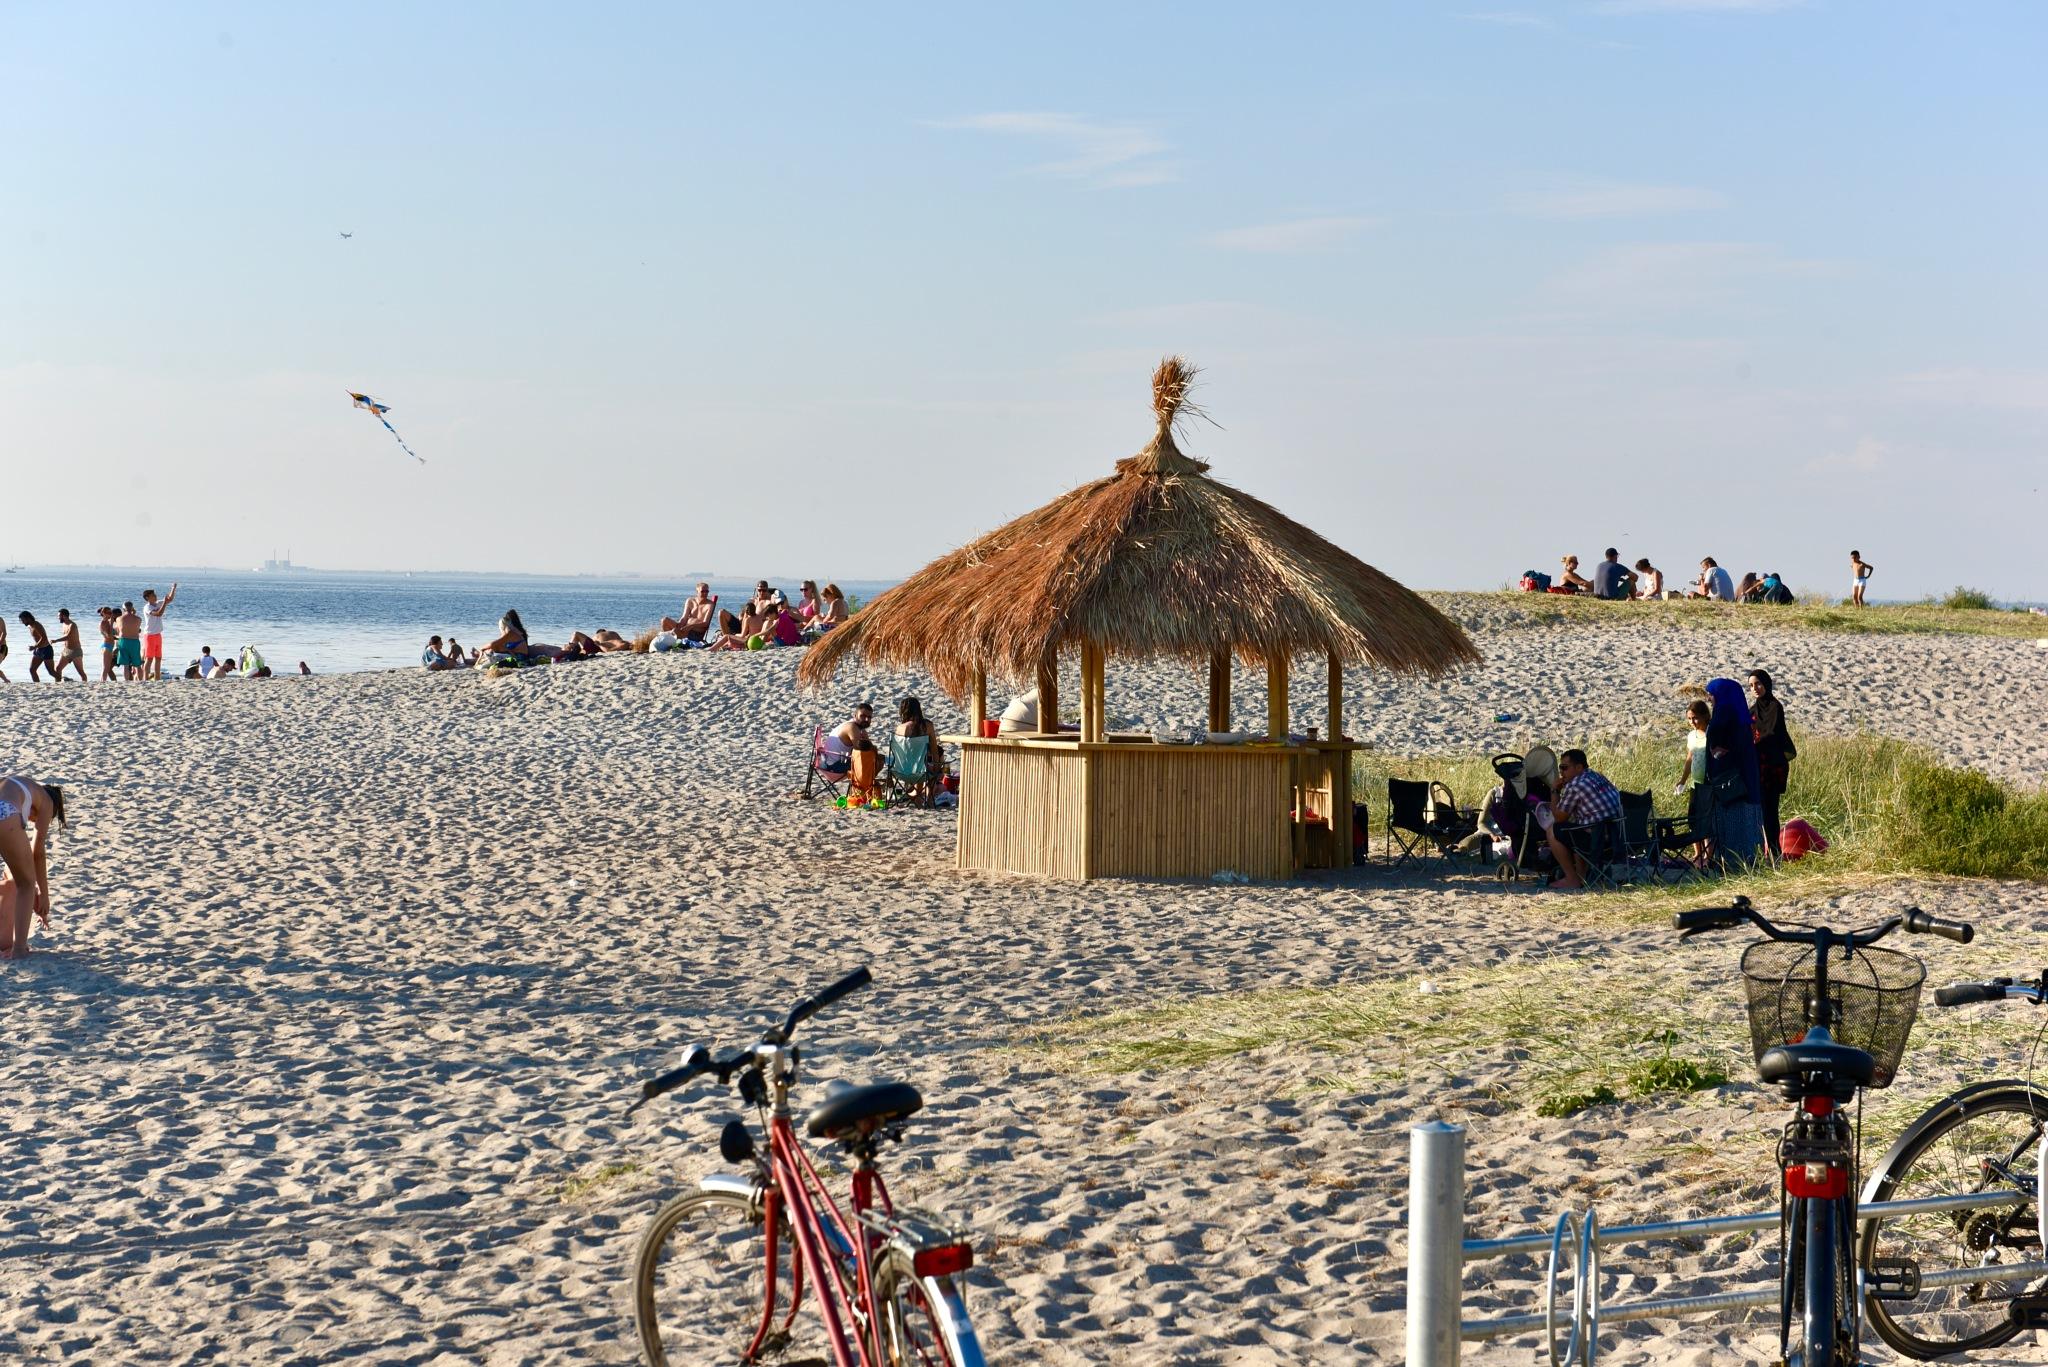 Malmö beach 5! by Memed Bayatli